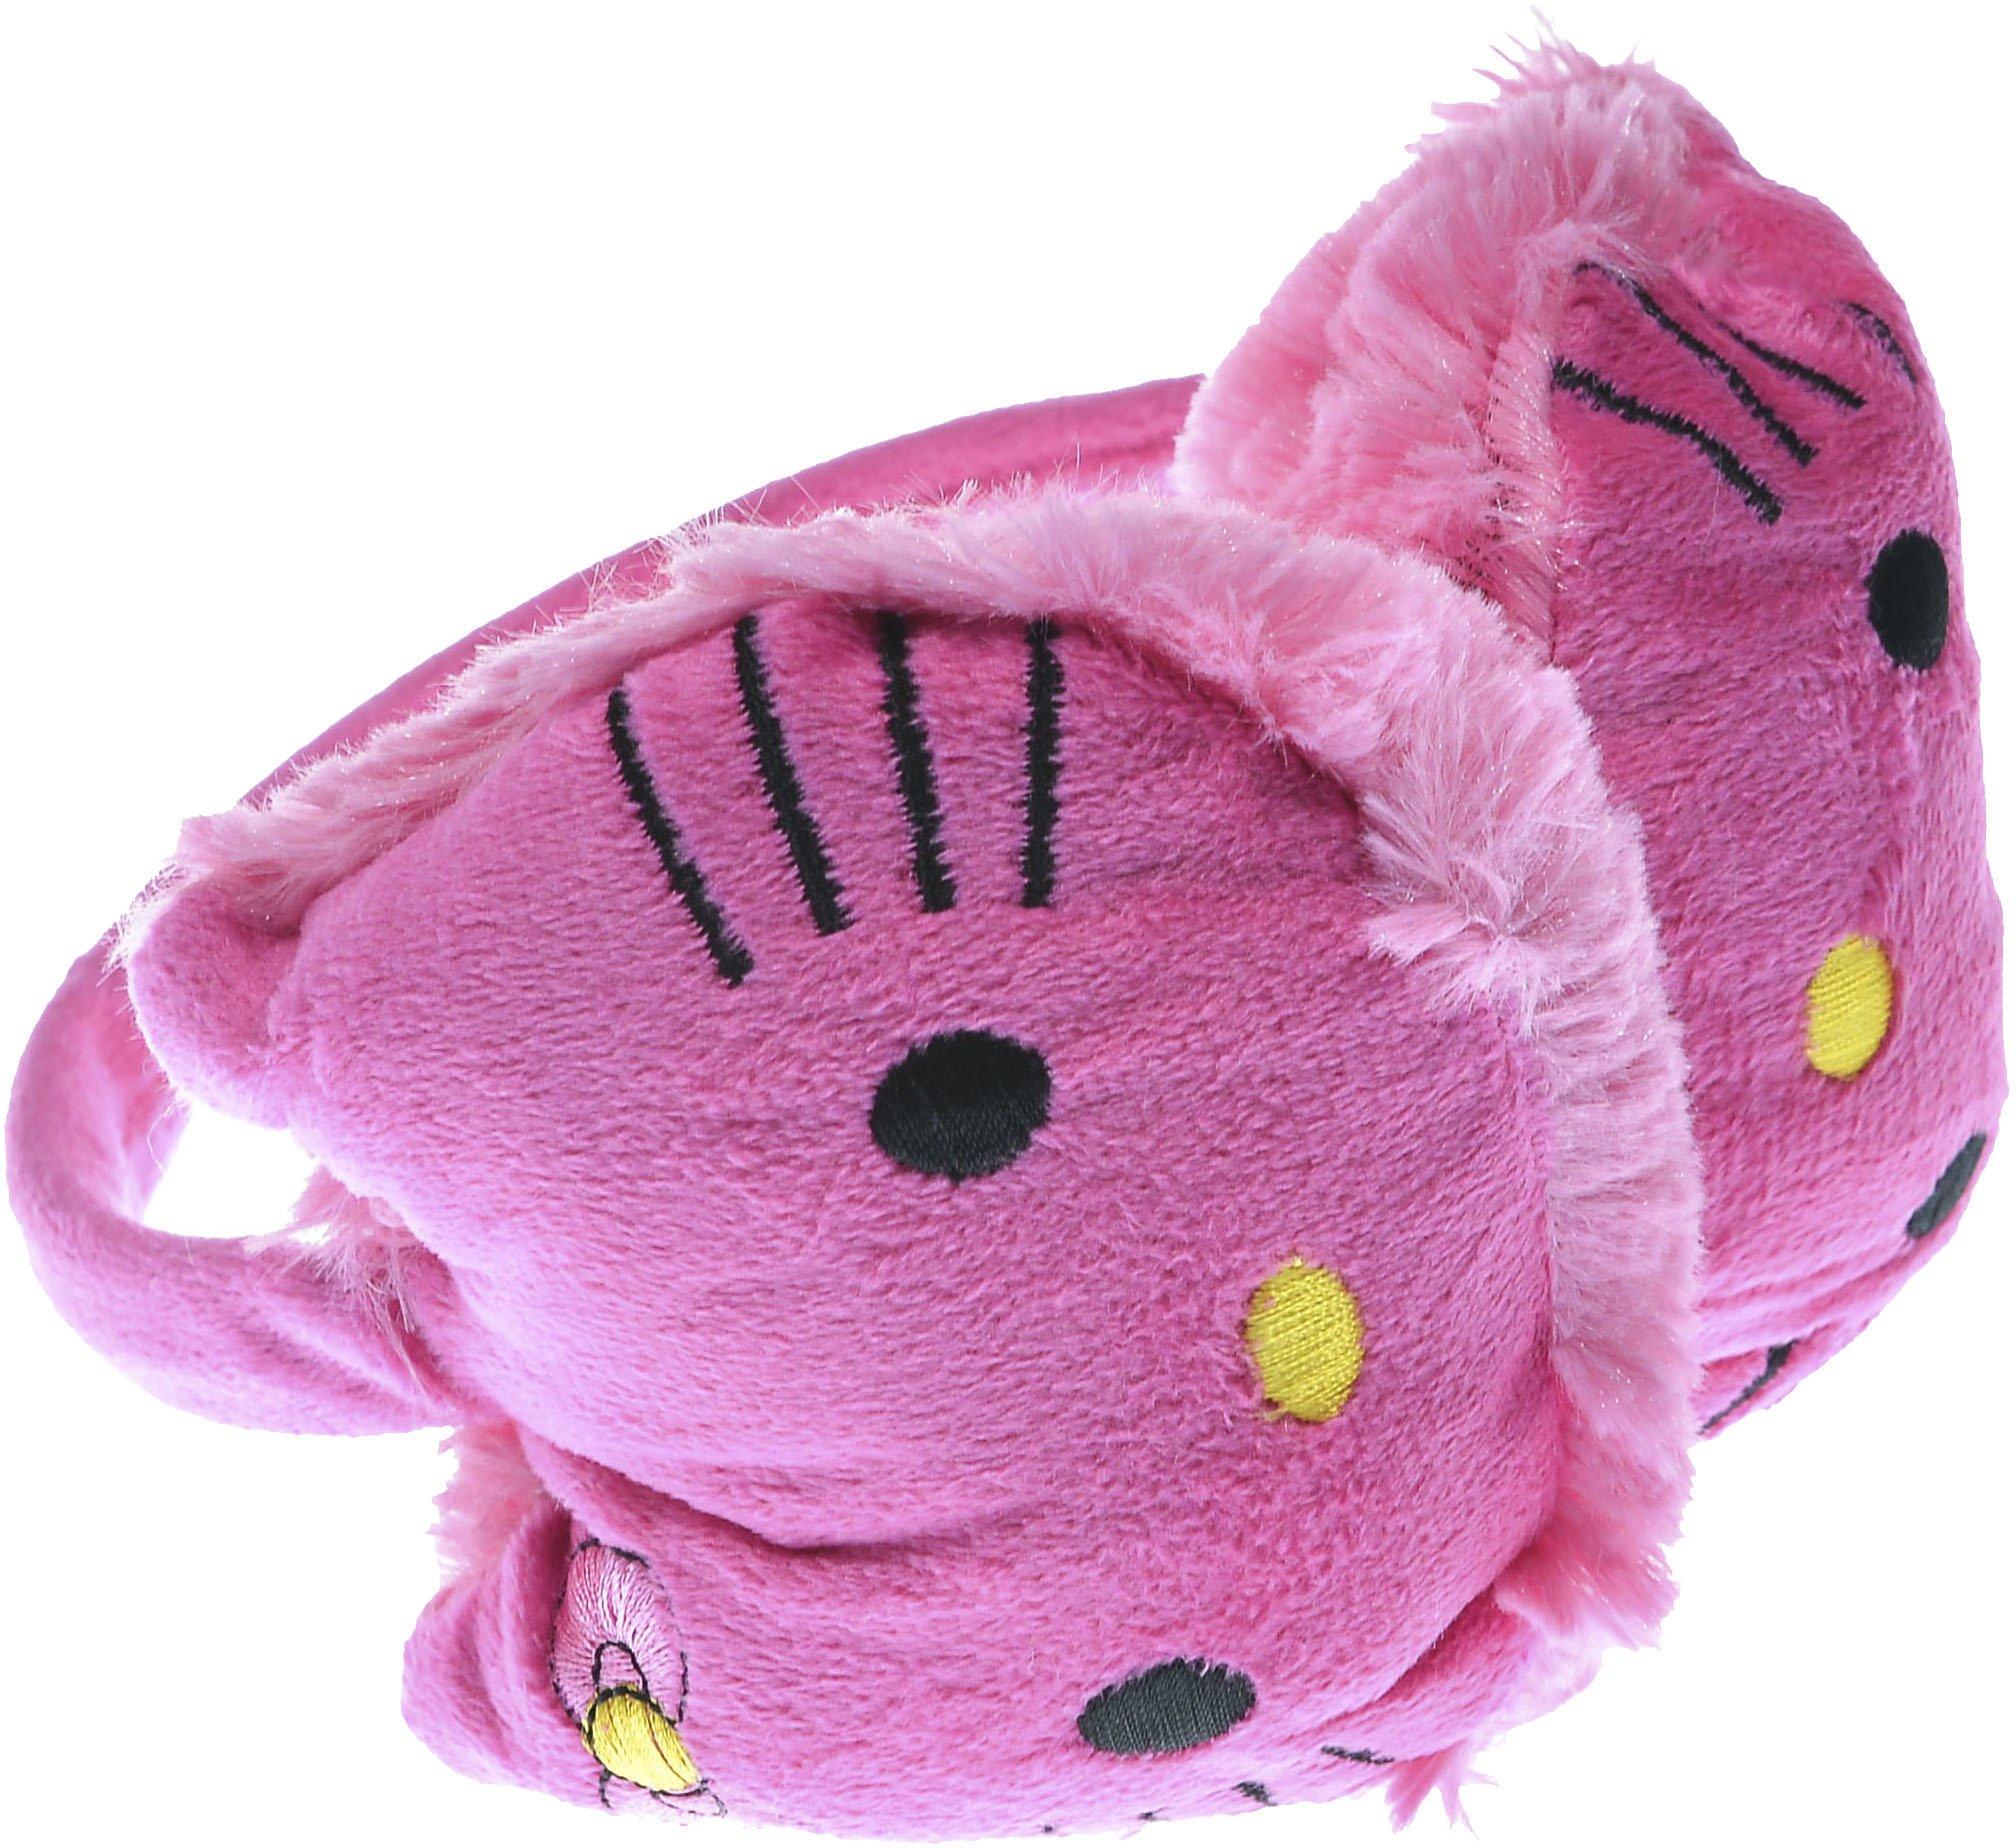 Hand By Hand Aprileo Girl Hello Kitty Earmuff Ear Warmer Animal Faux Fur [Deep Pink.](One Size)